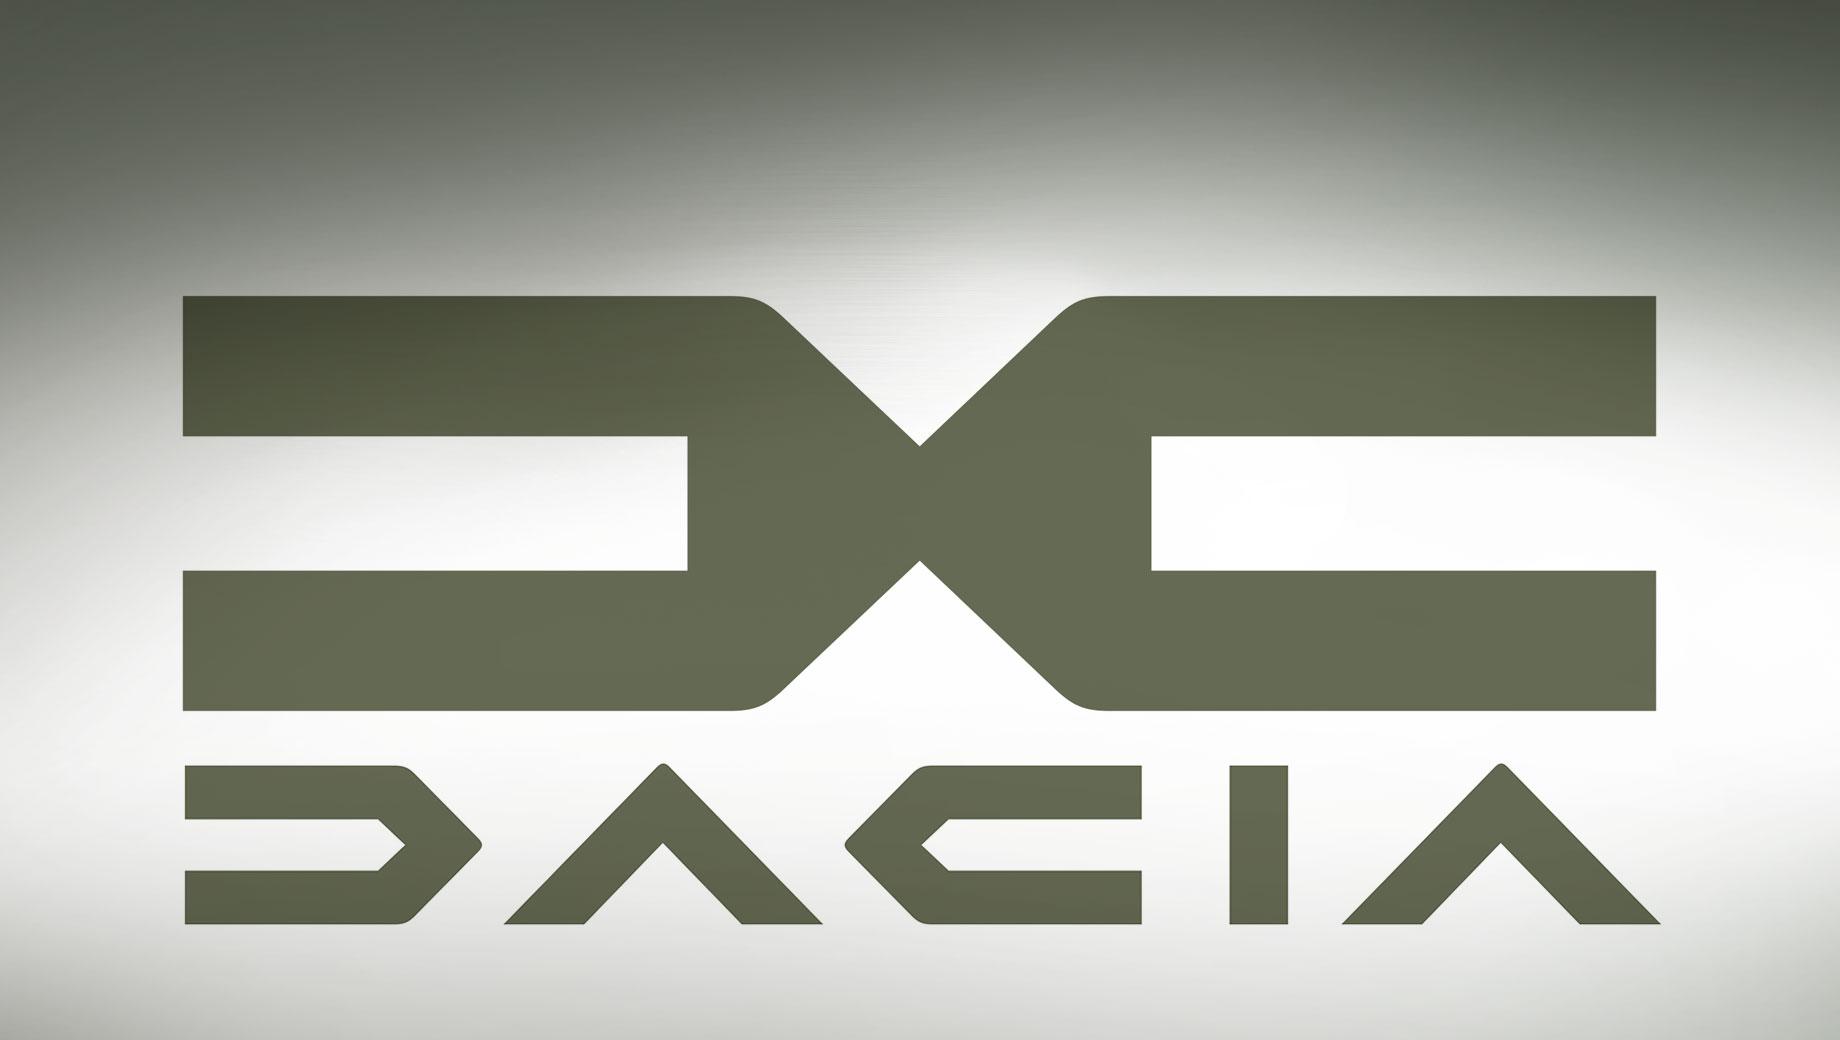 Марка Dacia презентовала новую фирменную символику